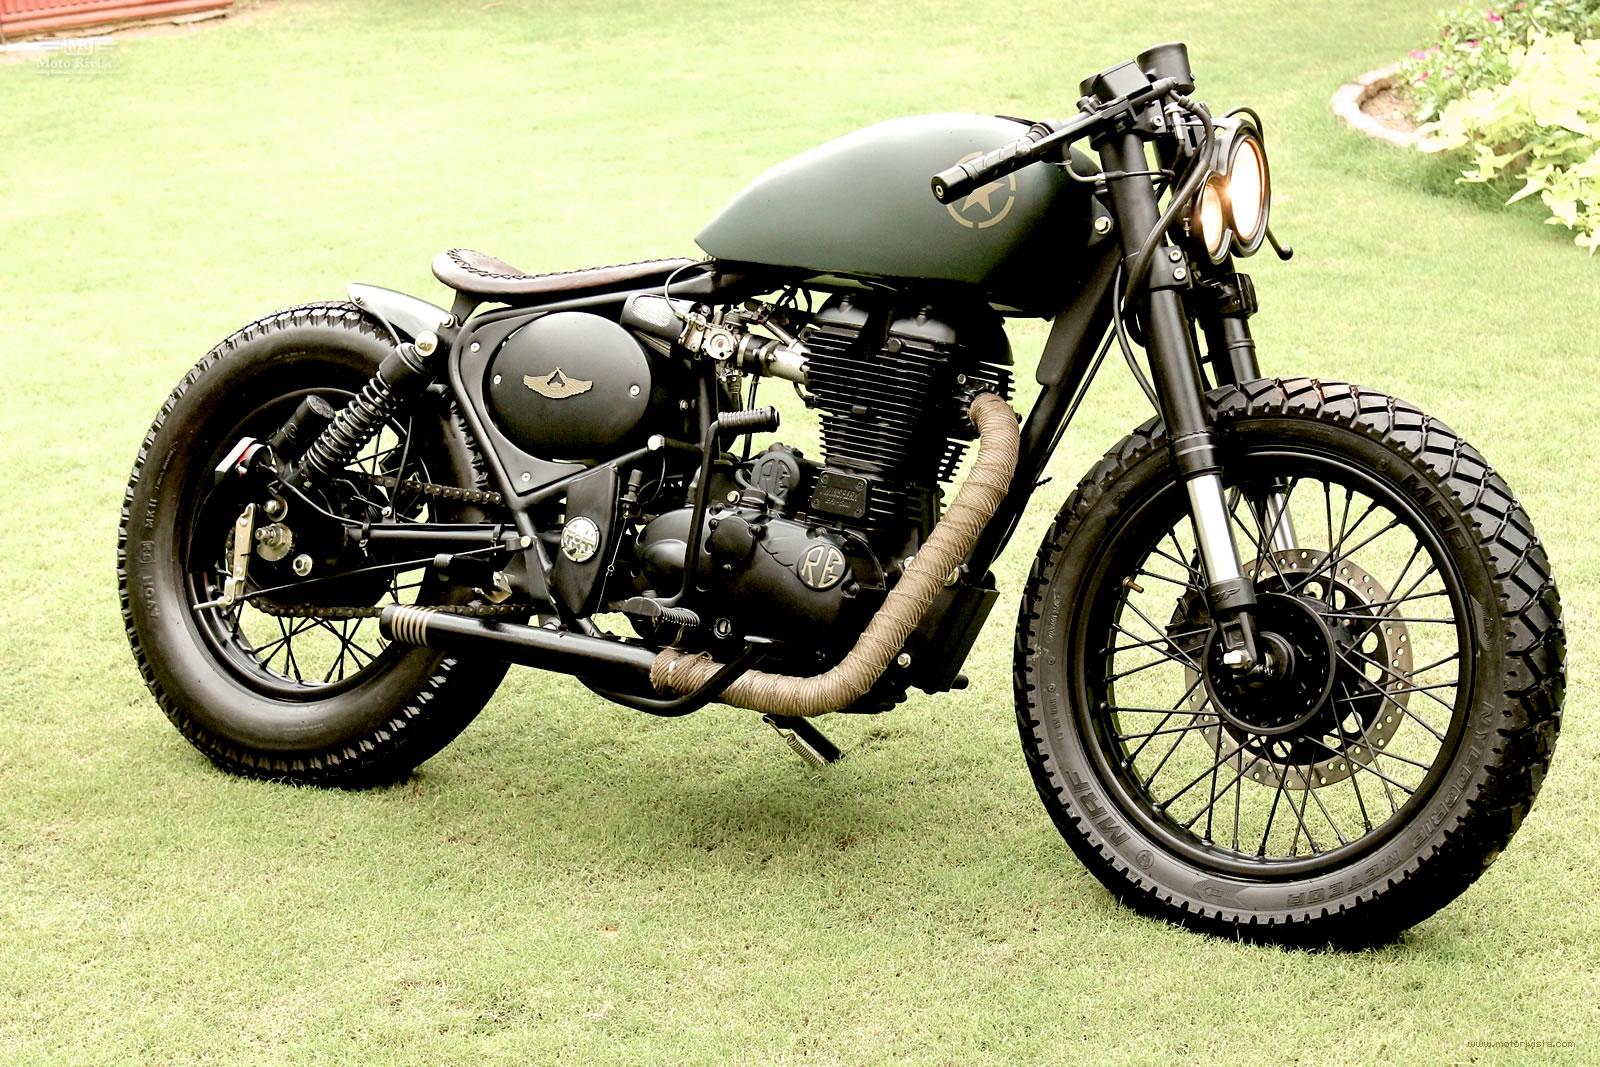 Custom-Royal-Enfield-500cc-Classic-by-Rajputana-customs-2